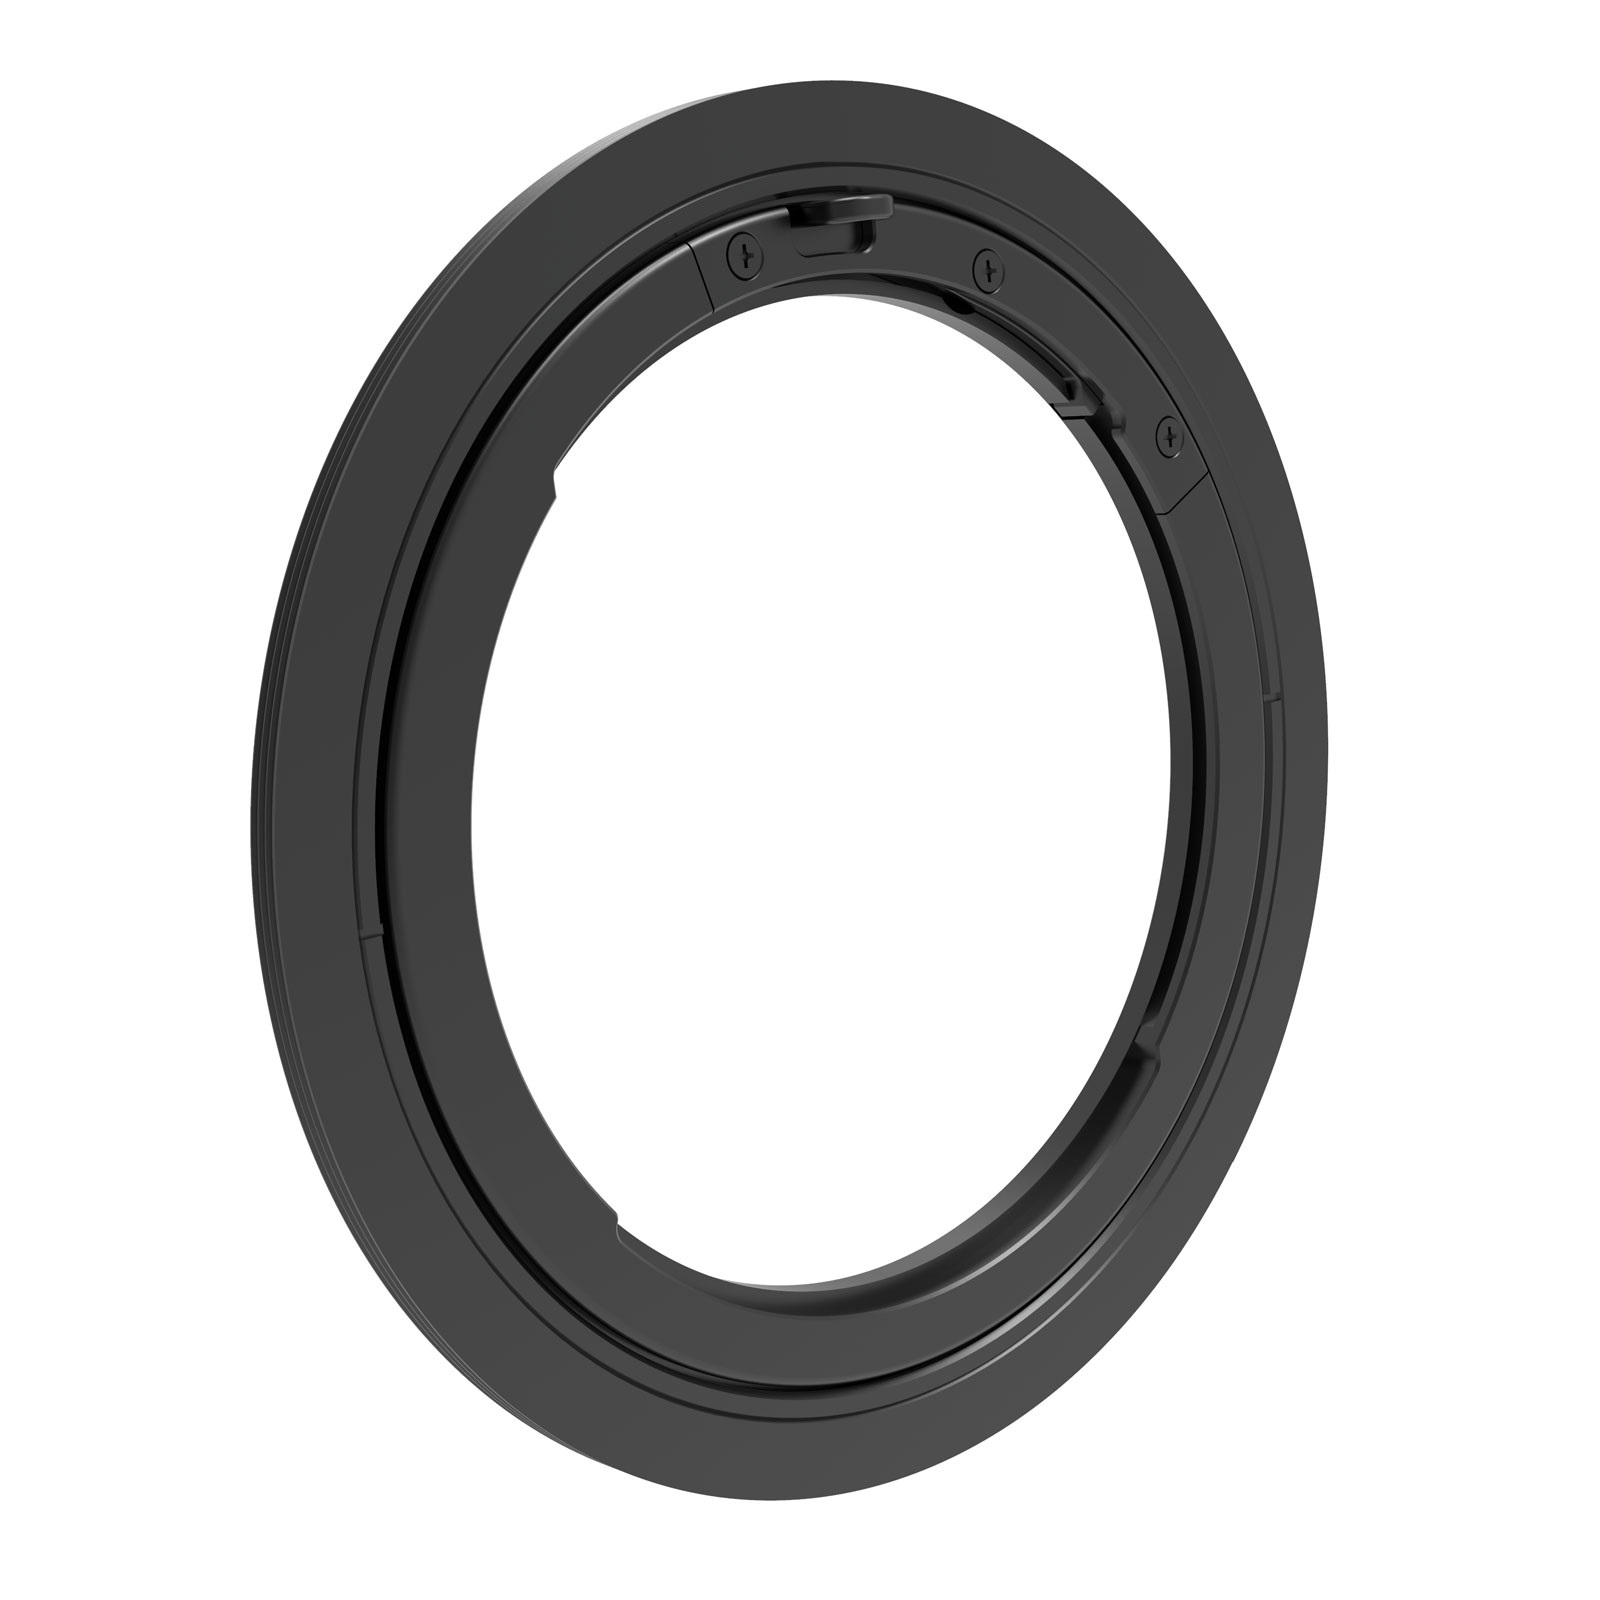 Nikon-Z-14-24mm-F2.8-S-Lens-Adapter-Ring